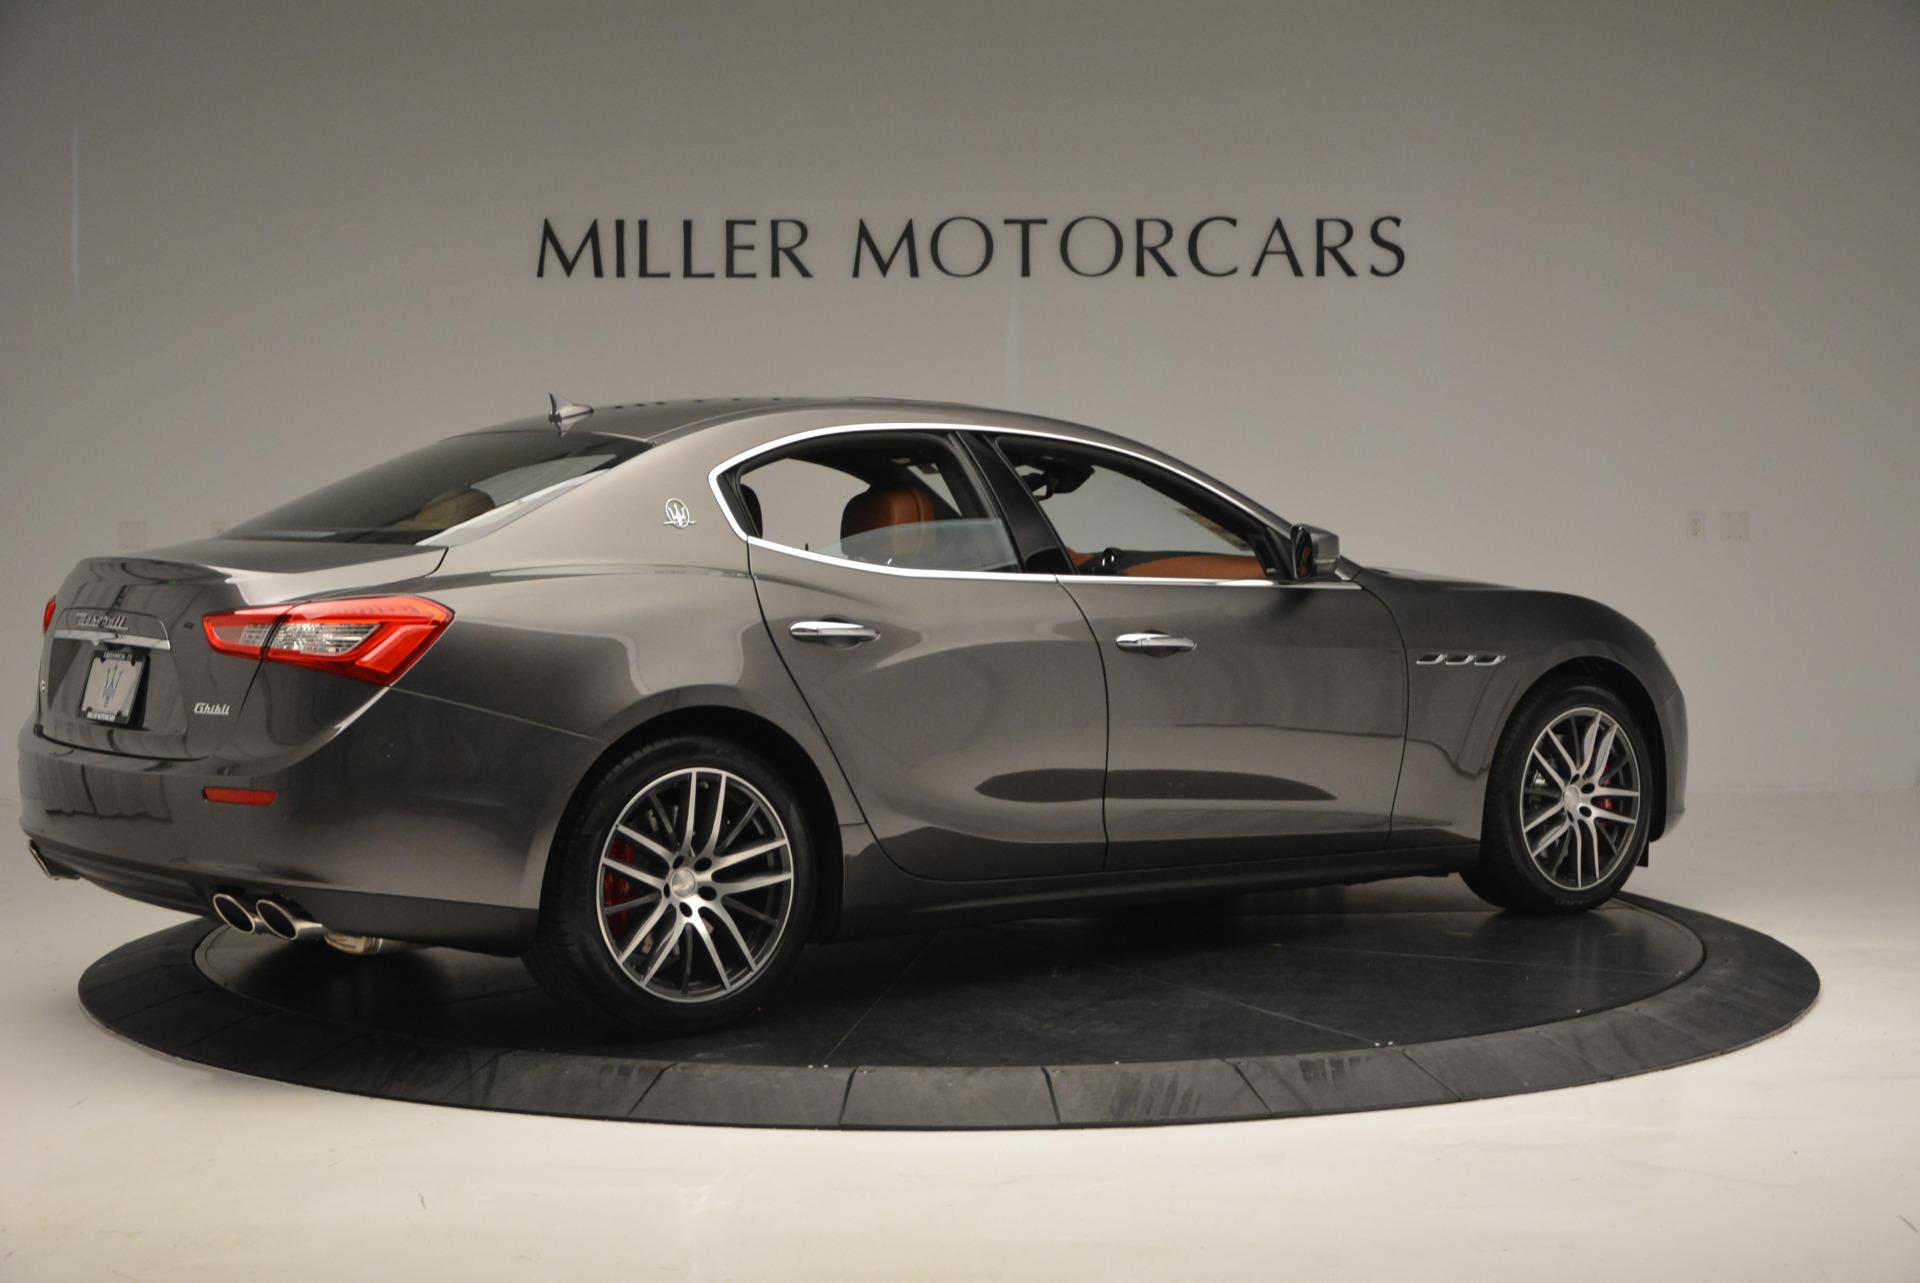 Used 2017 Maserati Ghibli S Q4  EX-LOANER For Sale In Greenwich, CT. Alfa Romeo of Greenwich, W311 565_p8